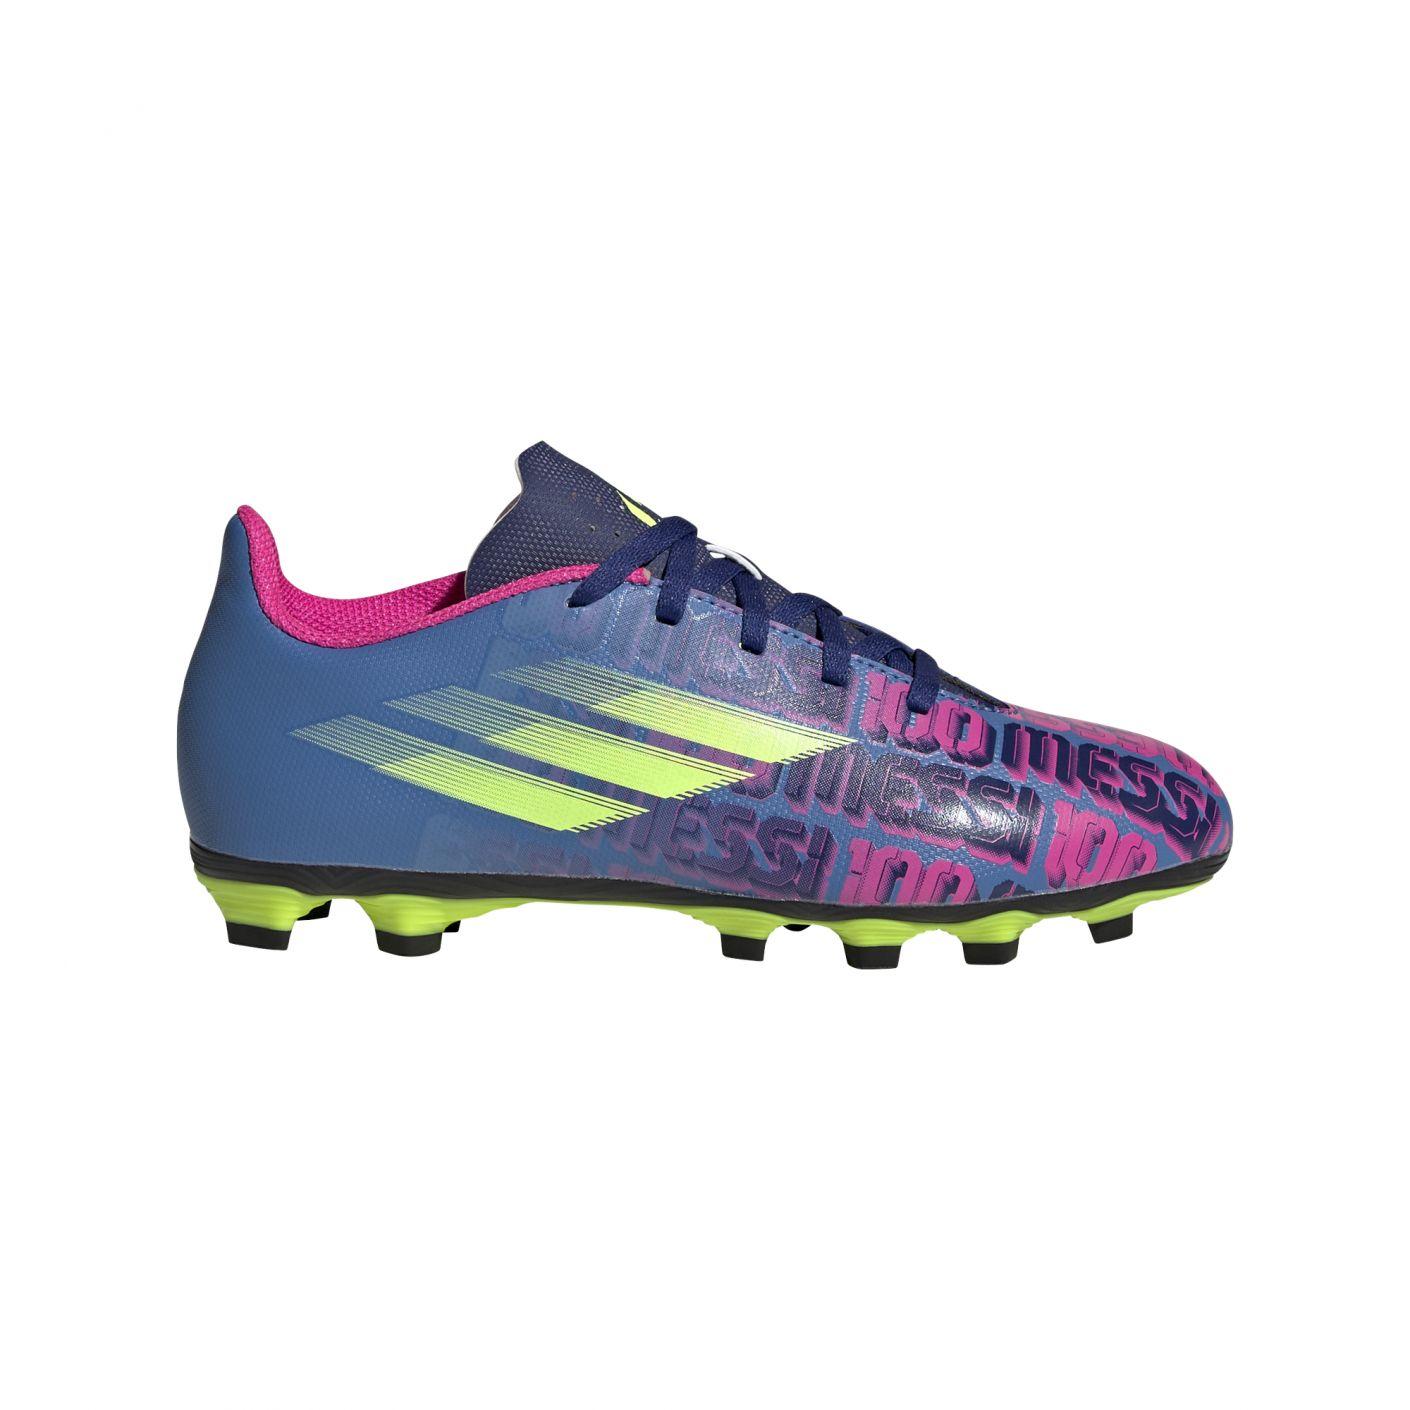 adidas X Speedflow Messi.4 Gras / Kunstgras Voetbalschoenen (FxG) Kids Blauw Roze Geel